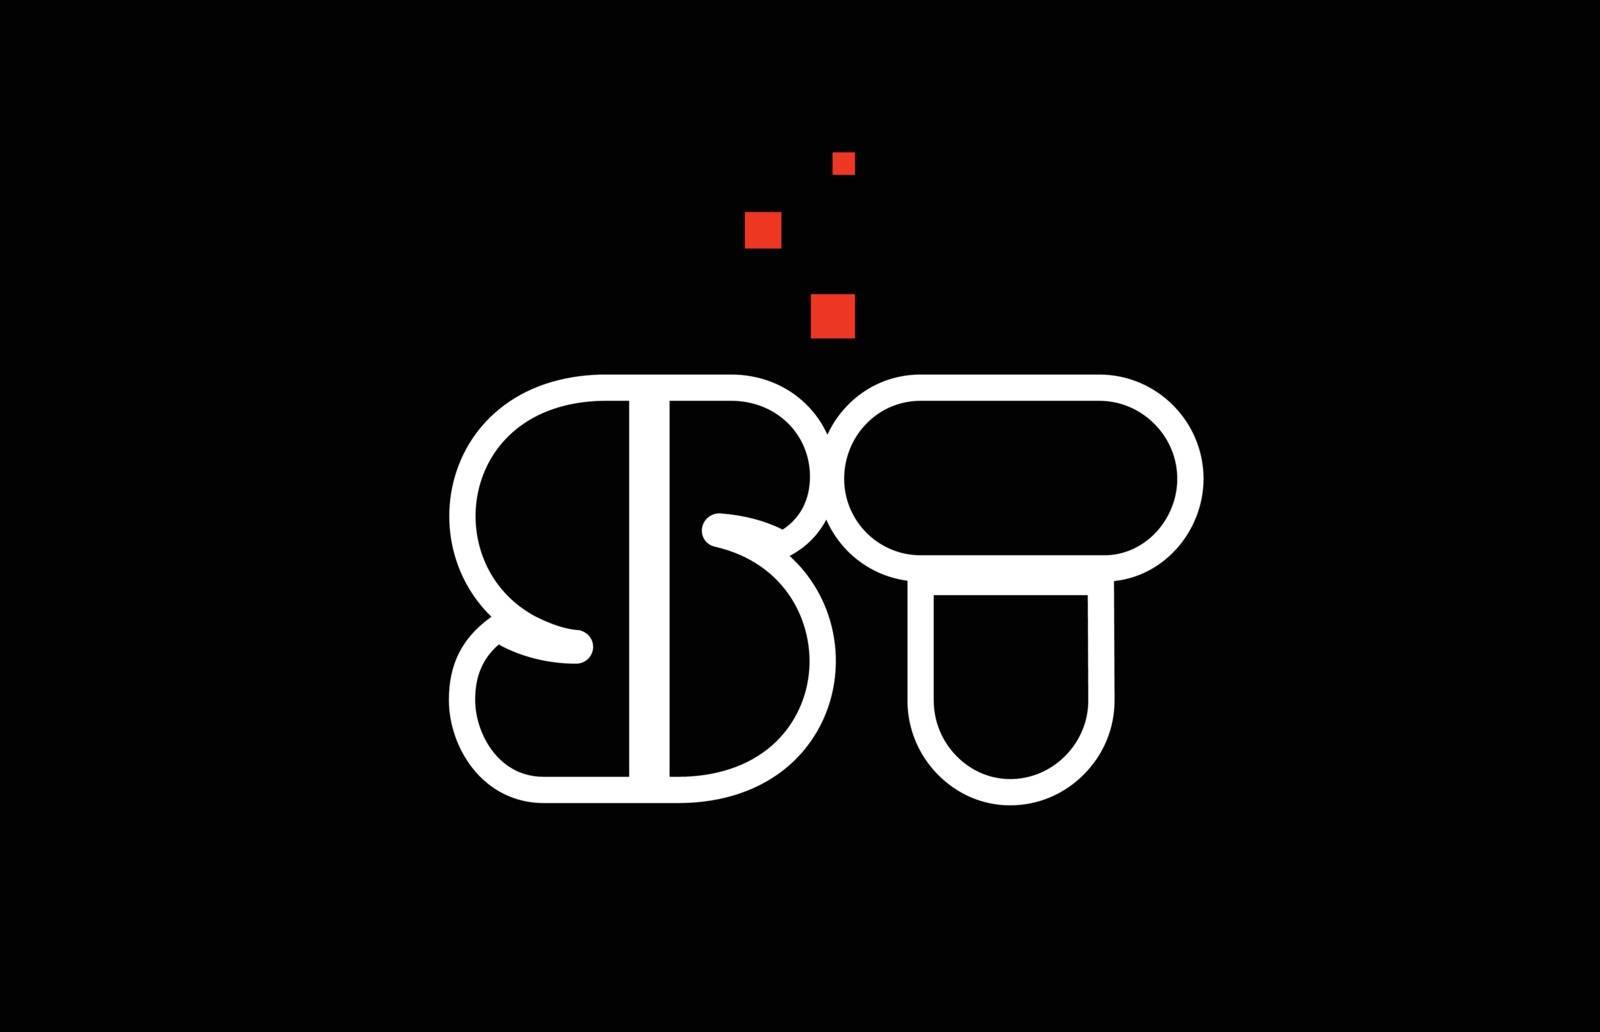 ST S T black white red alphabet letter combination logo icon des by dragomirescu